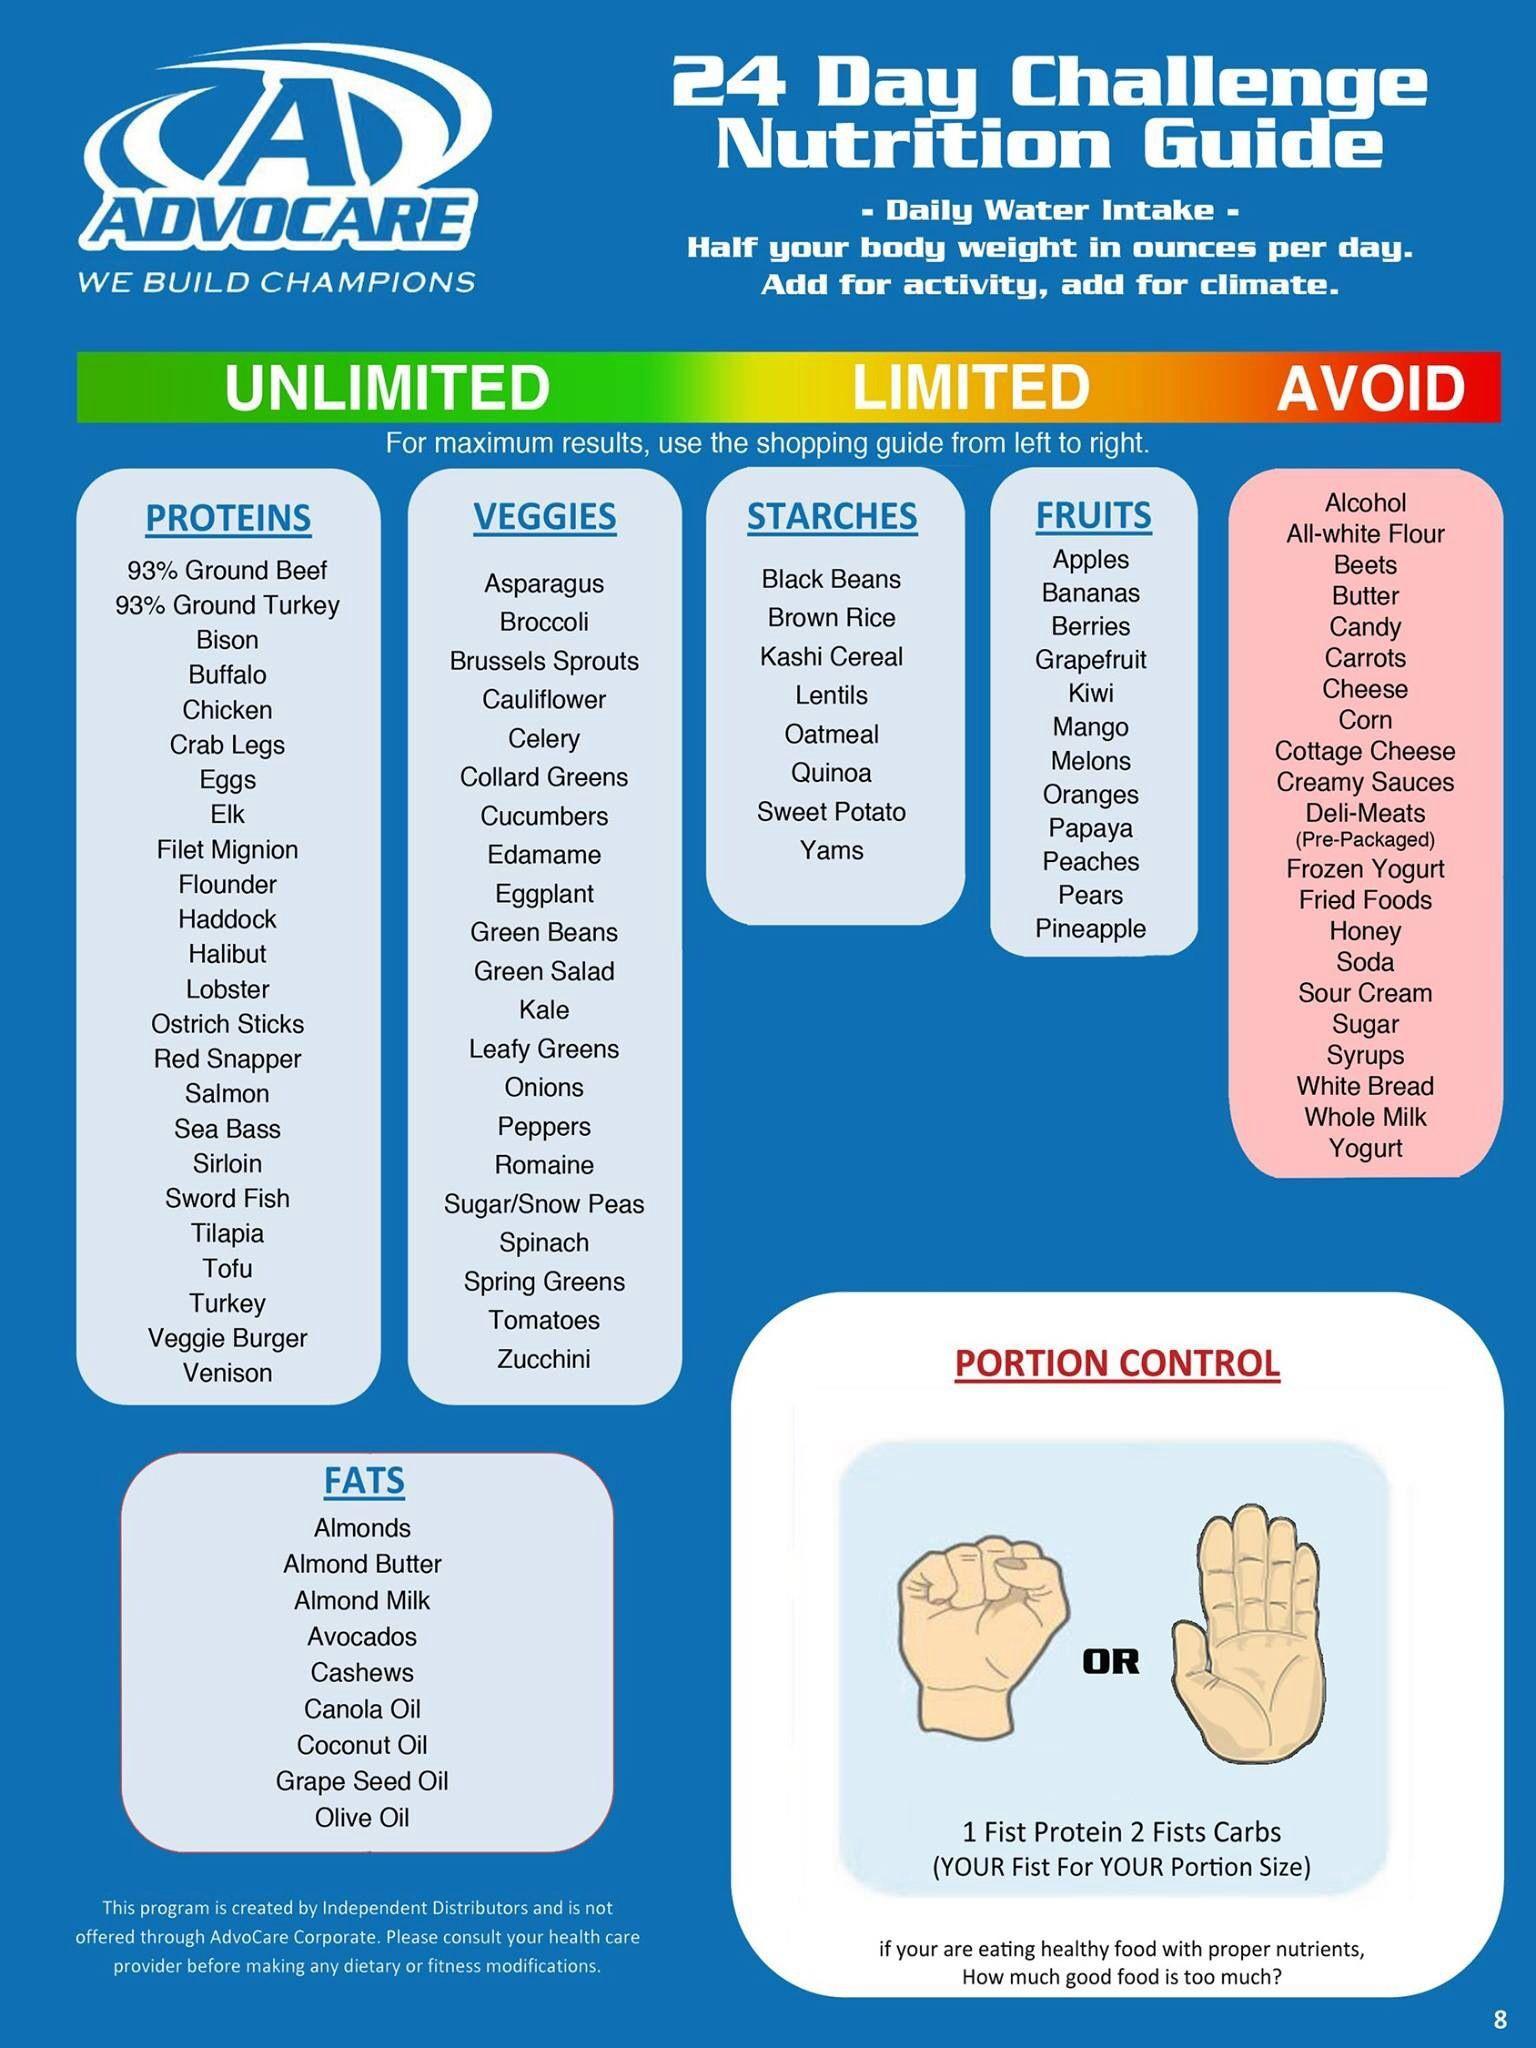 107 Best Advocare - Never Felt Healthier! Images | Advocare Intended For Advocare 24 Day Challenge Calendar